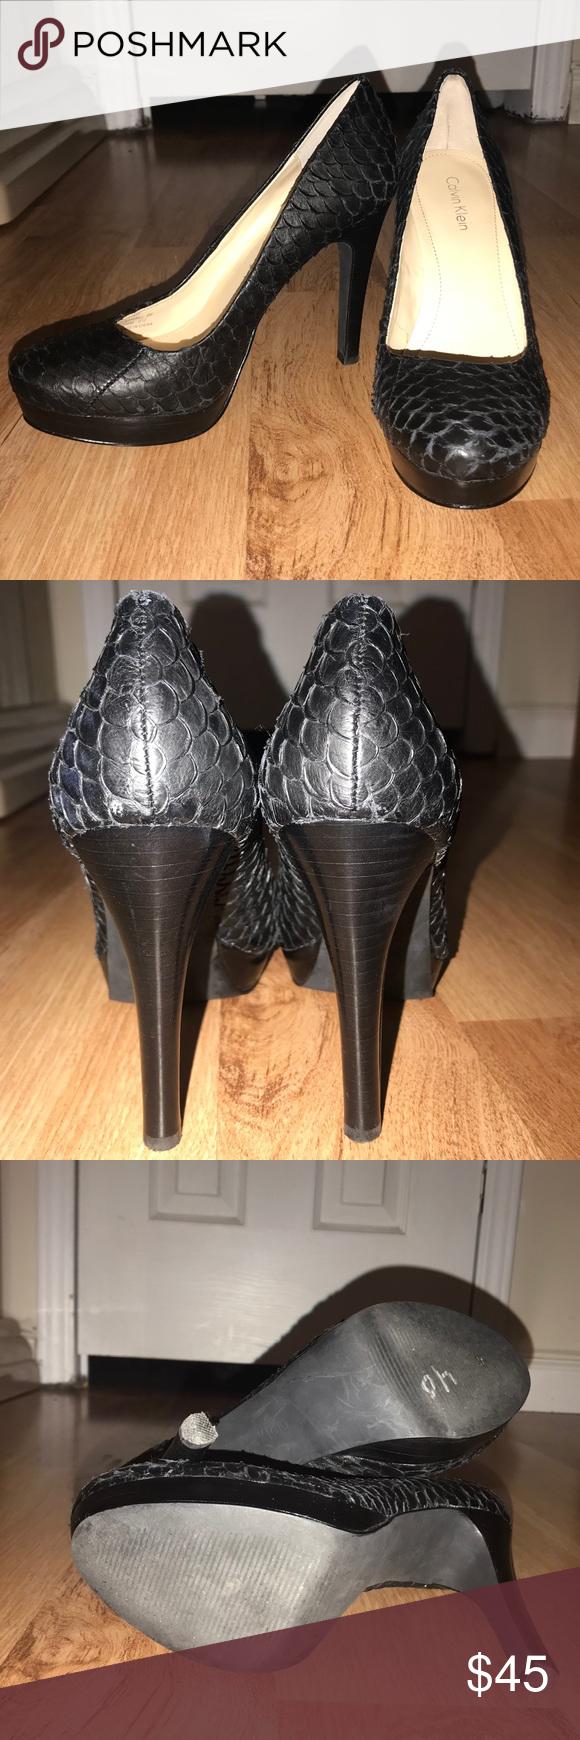 e9559e00ac8 Calvin Klein 4 Inch Heels Pumps